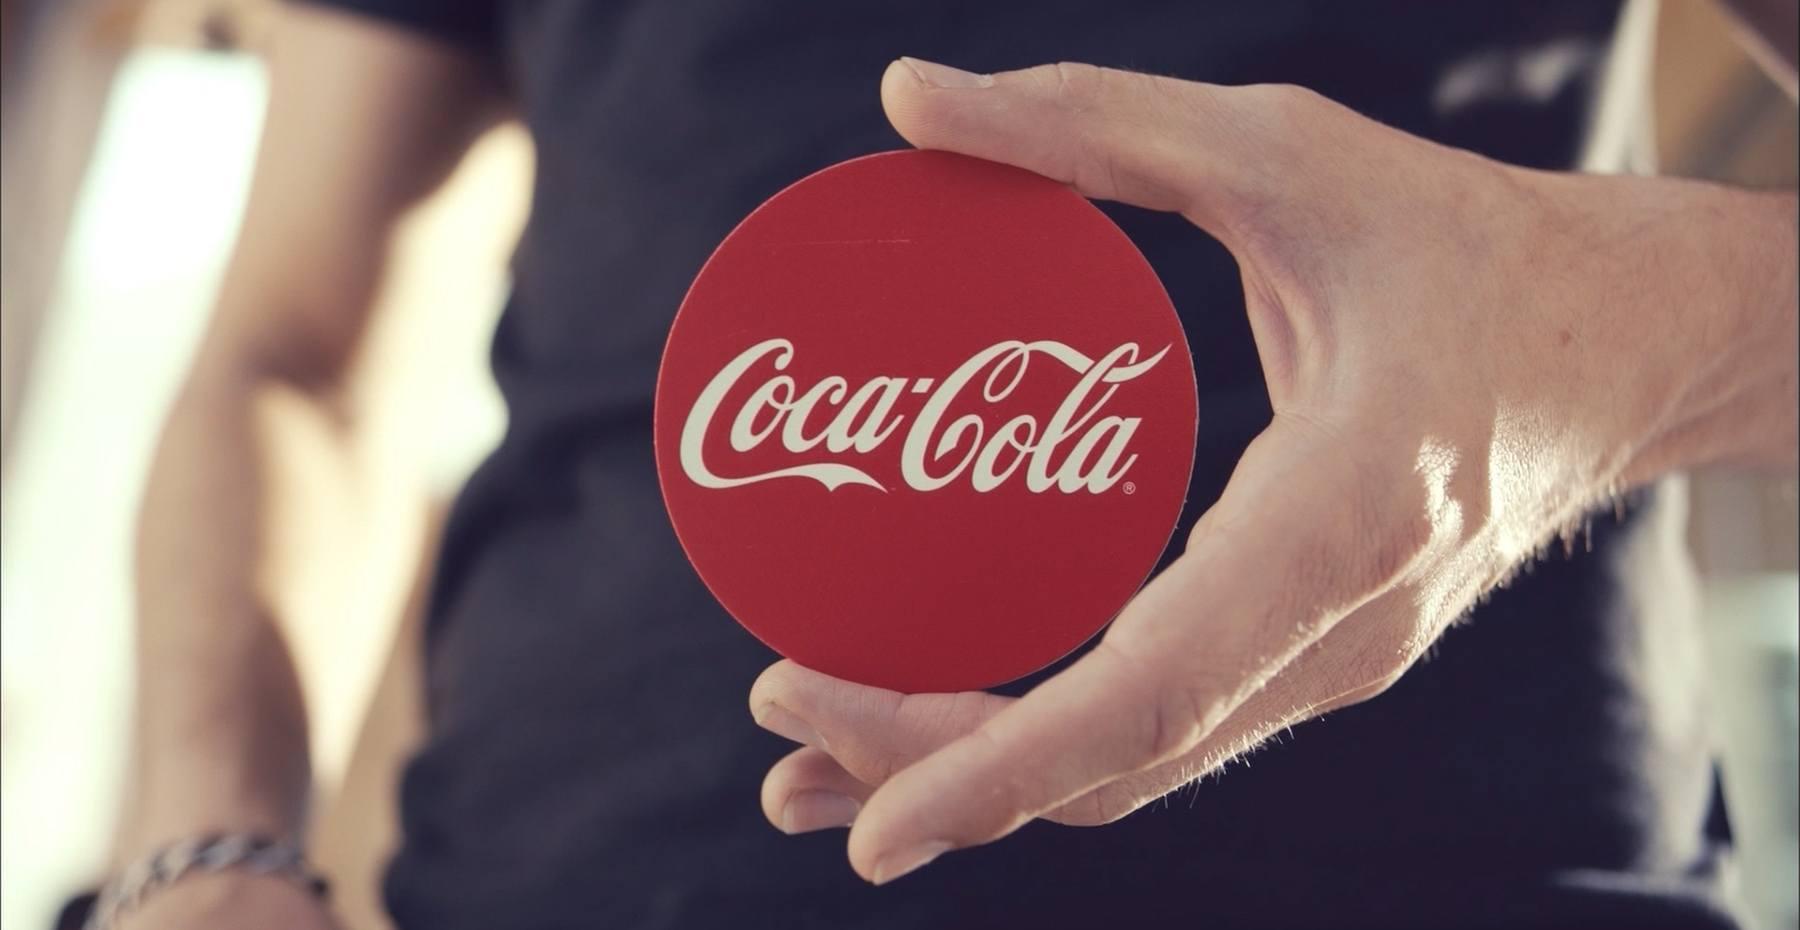 Dunyanin En Buyuk Markasi Coca Cola Nin Basarisinin Sirri Ne